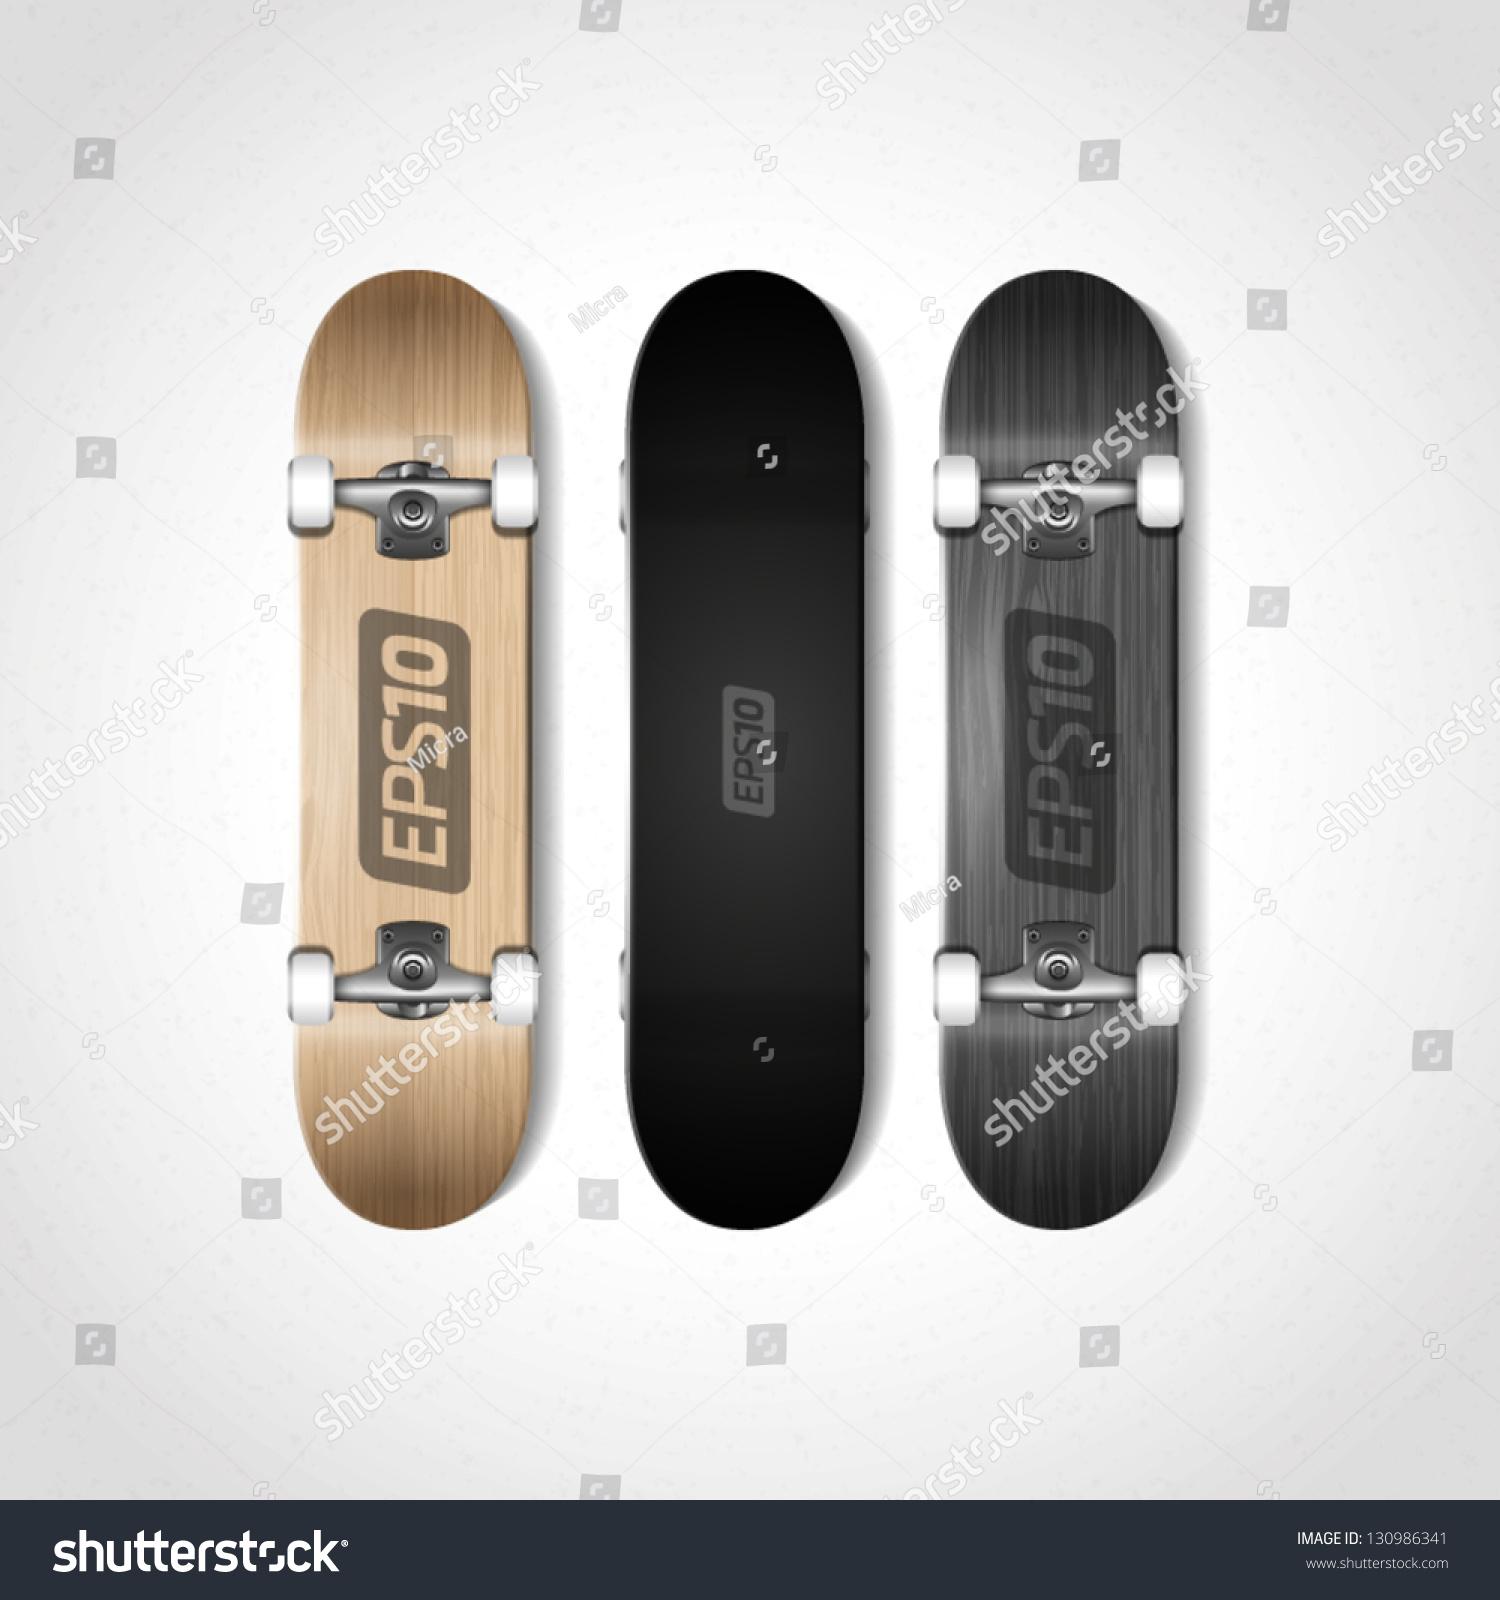 longboard truck template - photorealistic skateboard template stock vector 130986341